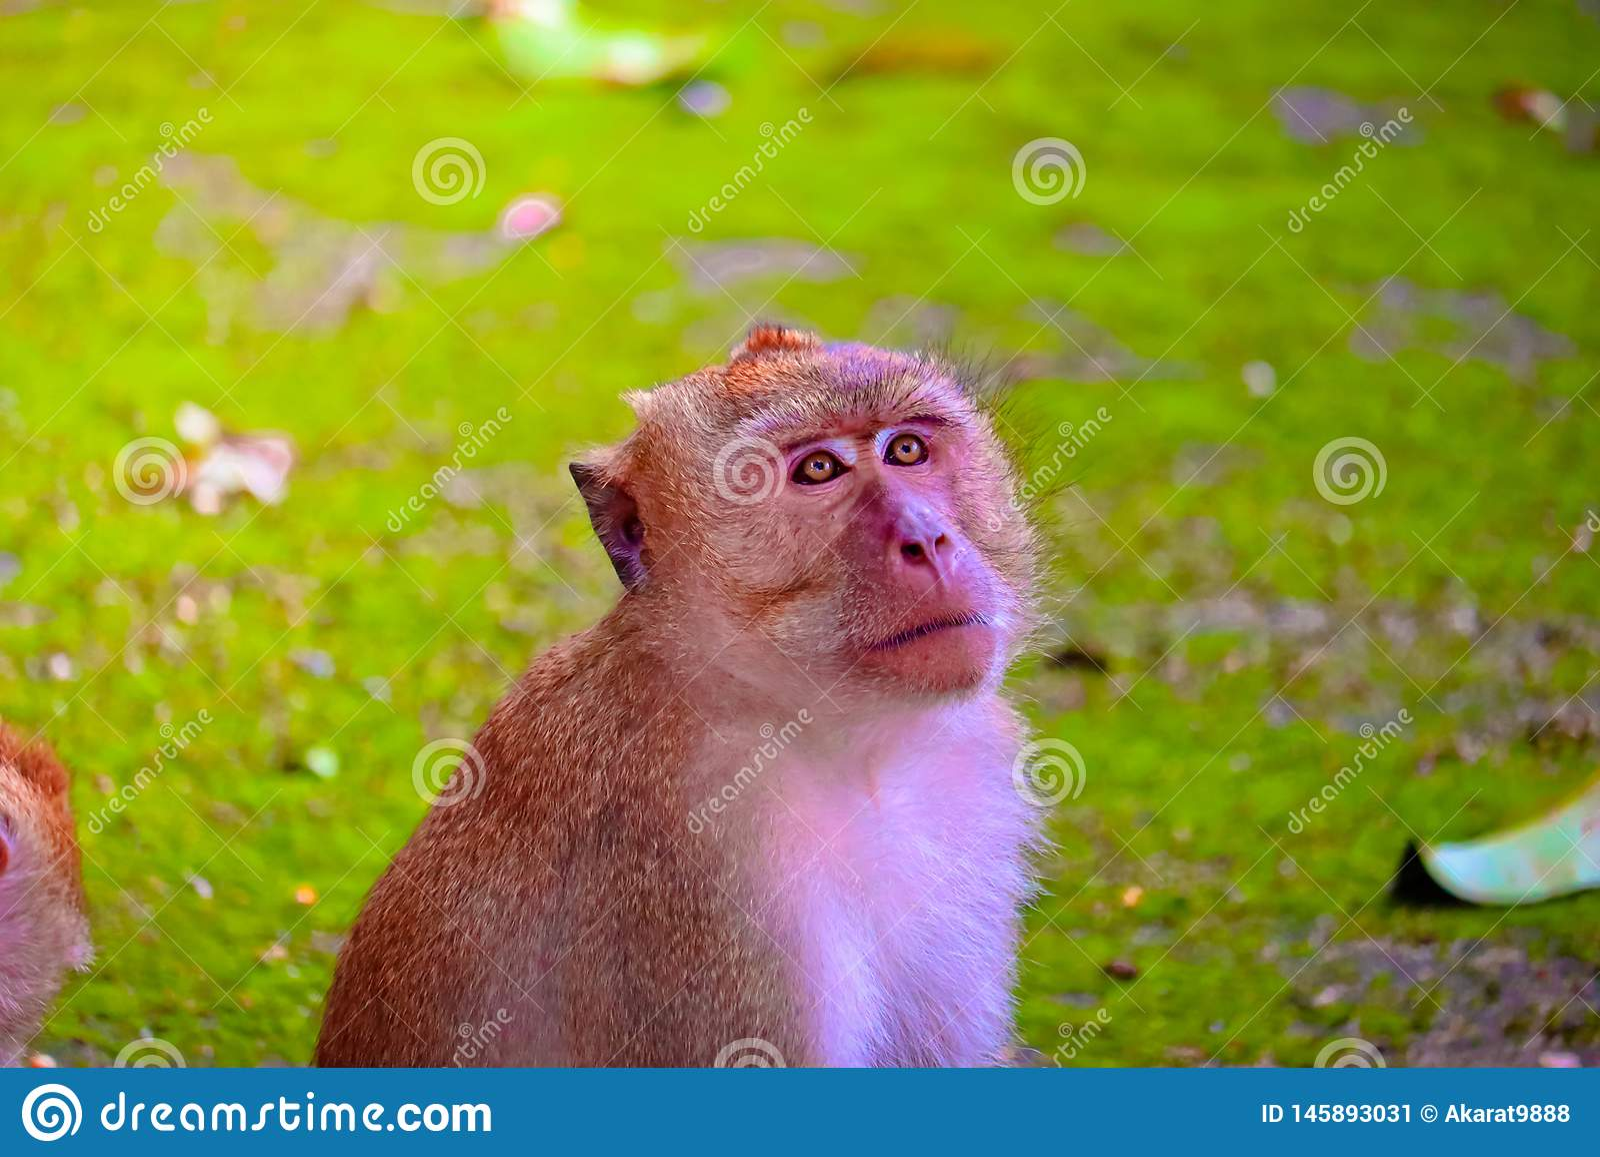 Le singe mange une banane